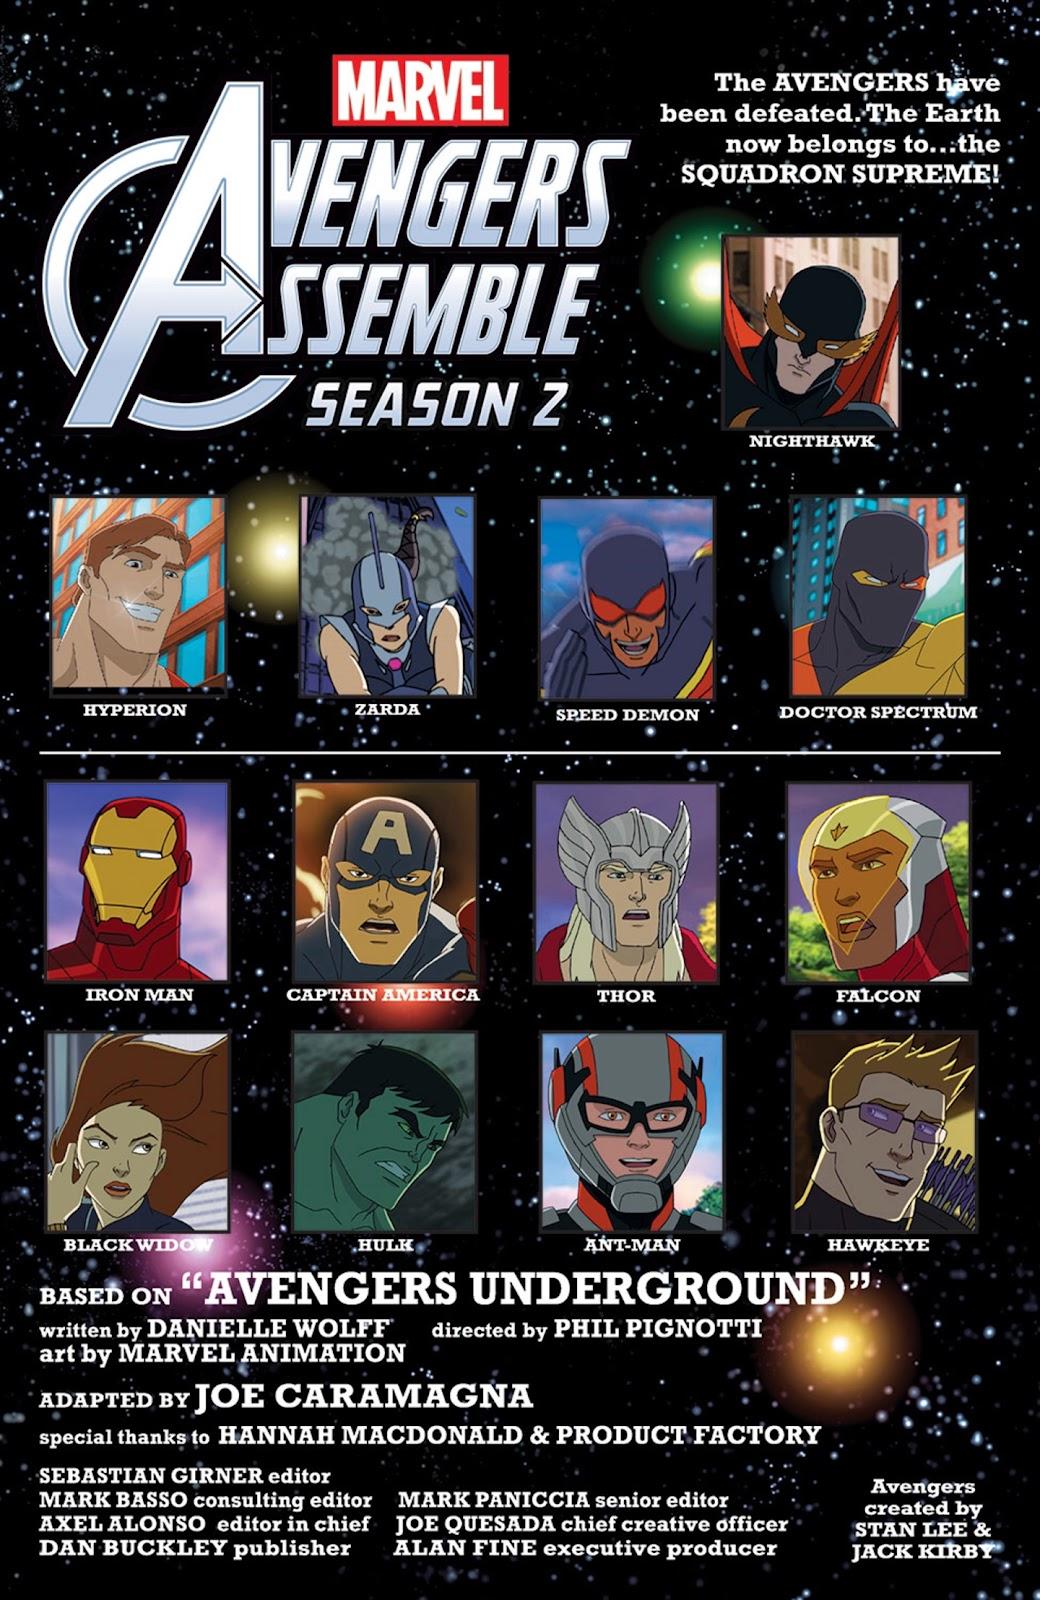 Read online Marvel Universe Avengers Assemble Season 2 comic -  Issue #14 - 4